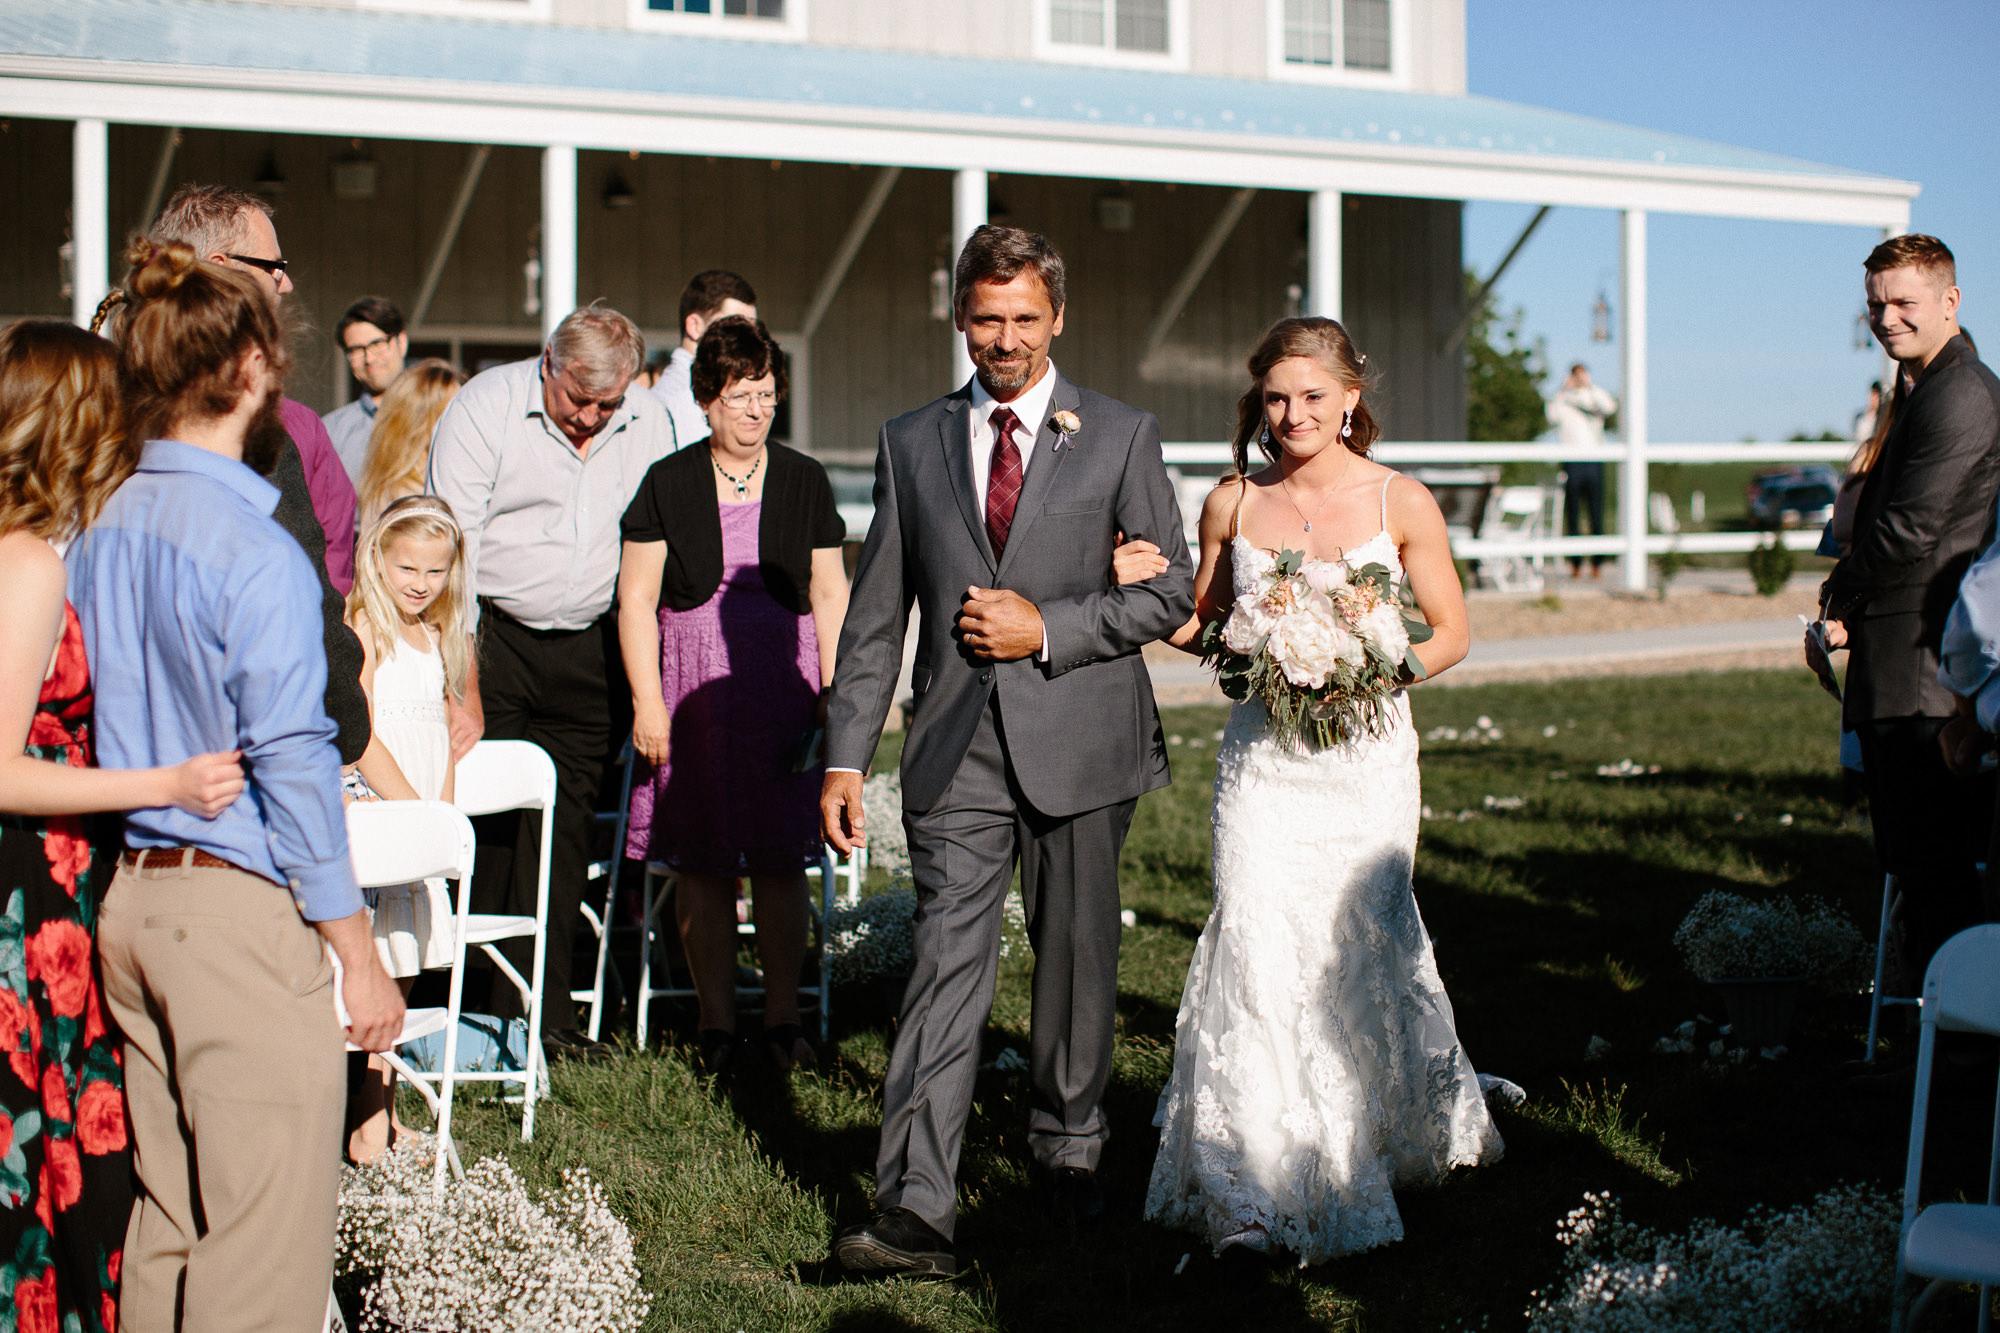 wedding-elopement-adventerous-romantic-timeless-south-dakota-blue-haven-barn-035.jpg